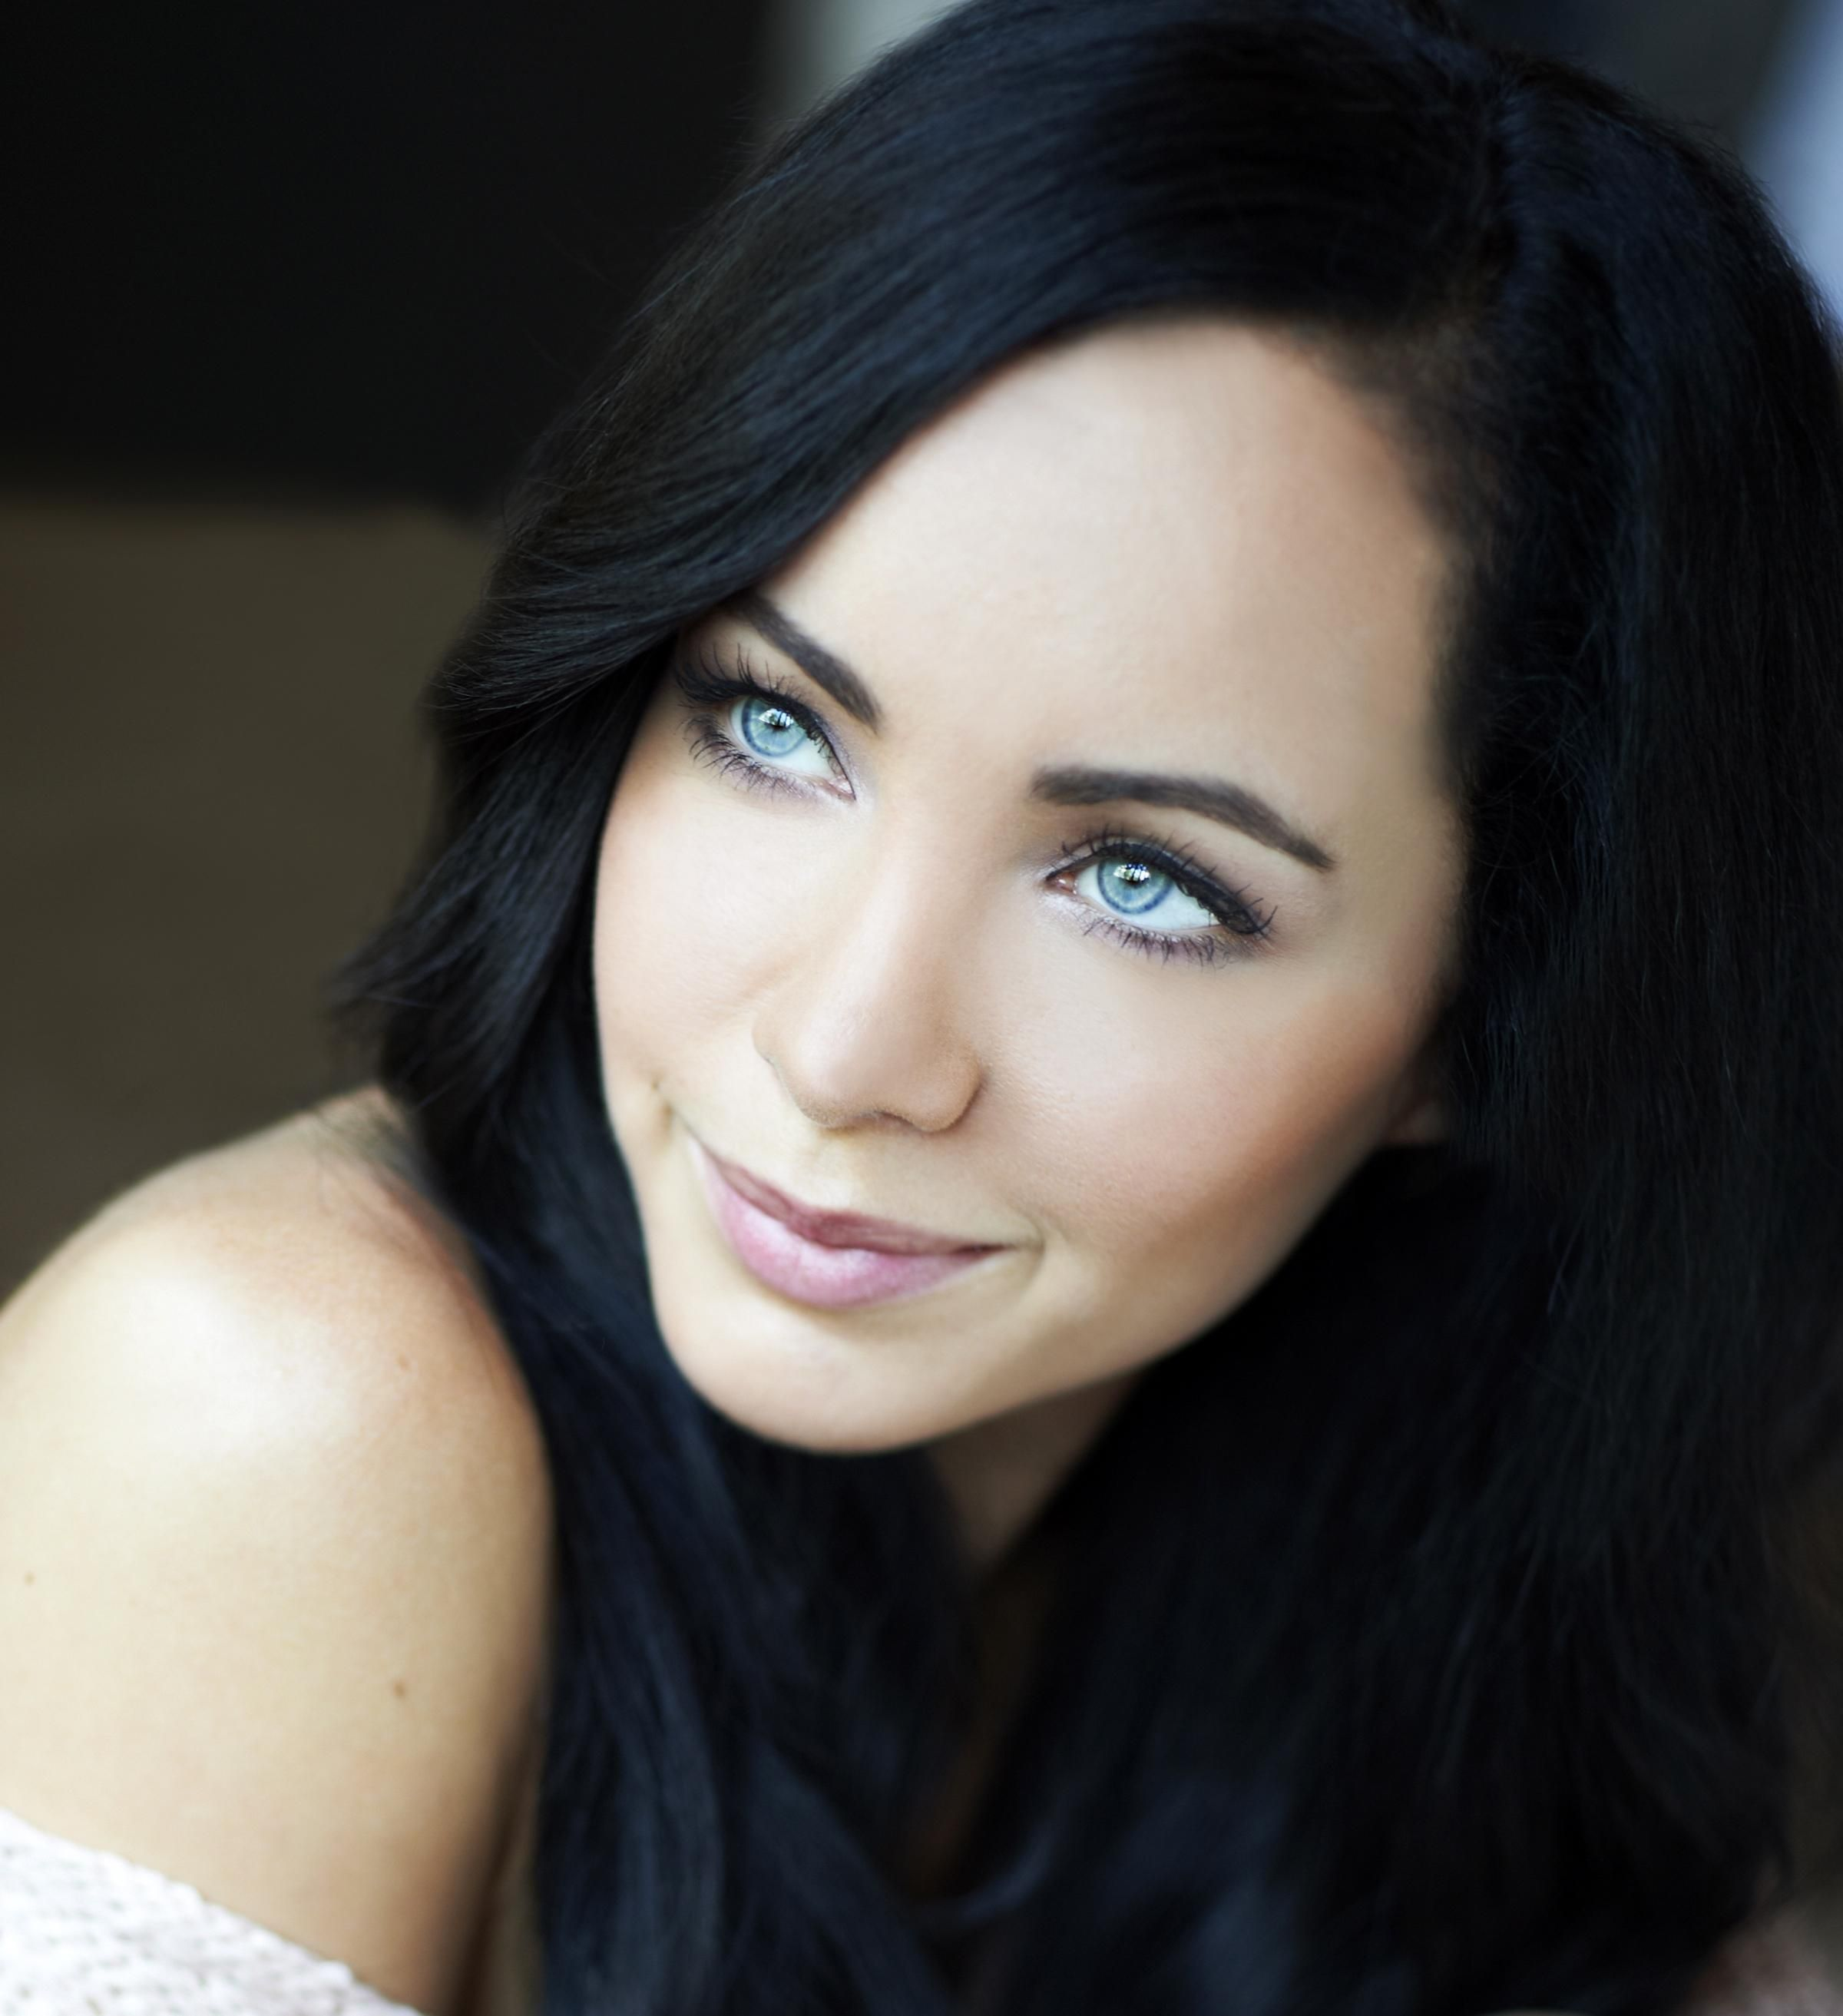 Black hair blue eyes girl